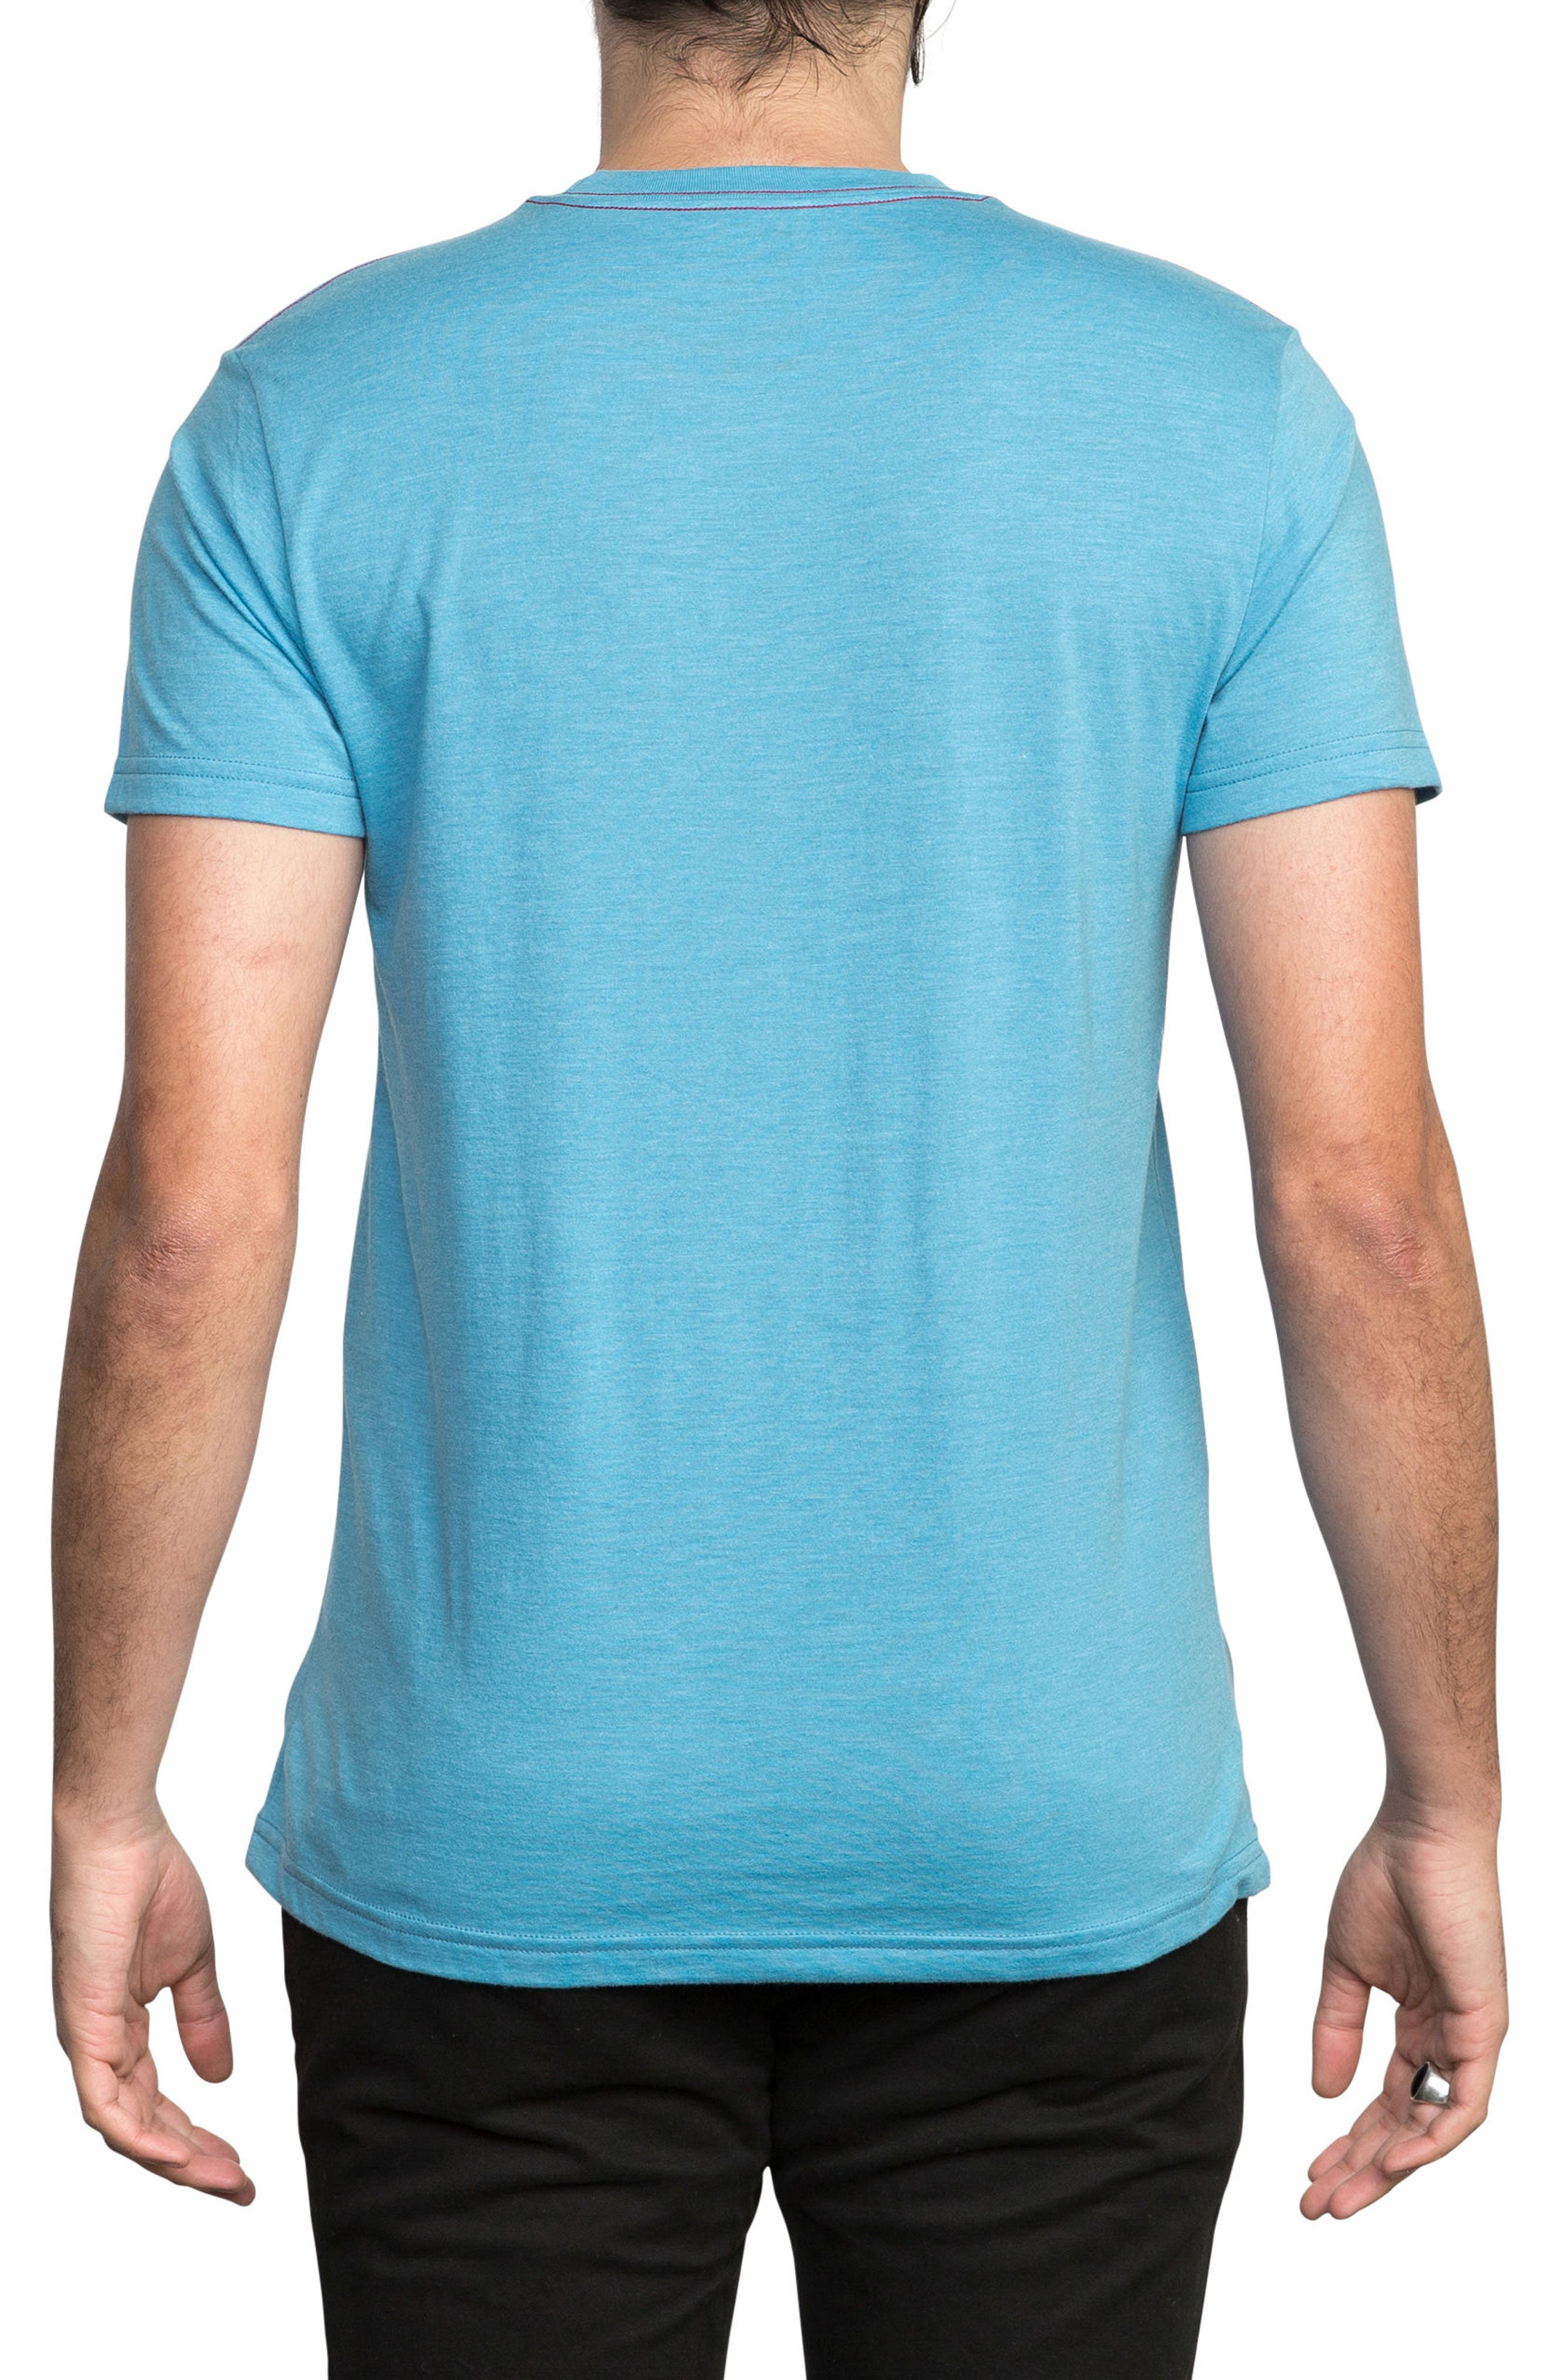 McFloral T-Shirt,                             Alternate thumbnail 2, color,                             Lagoon